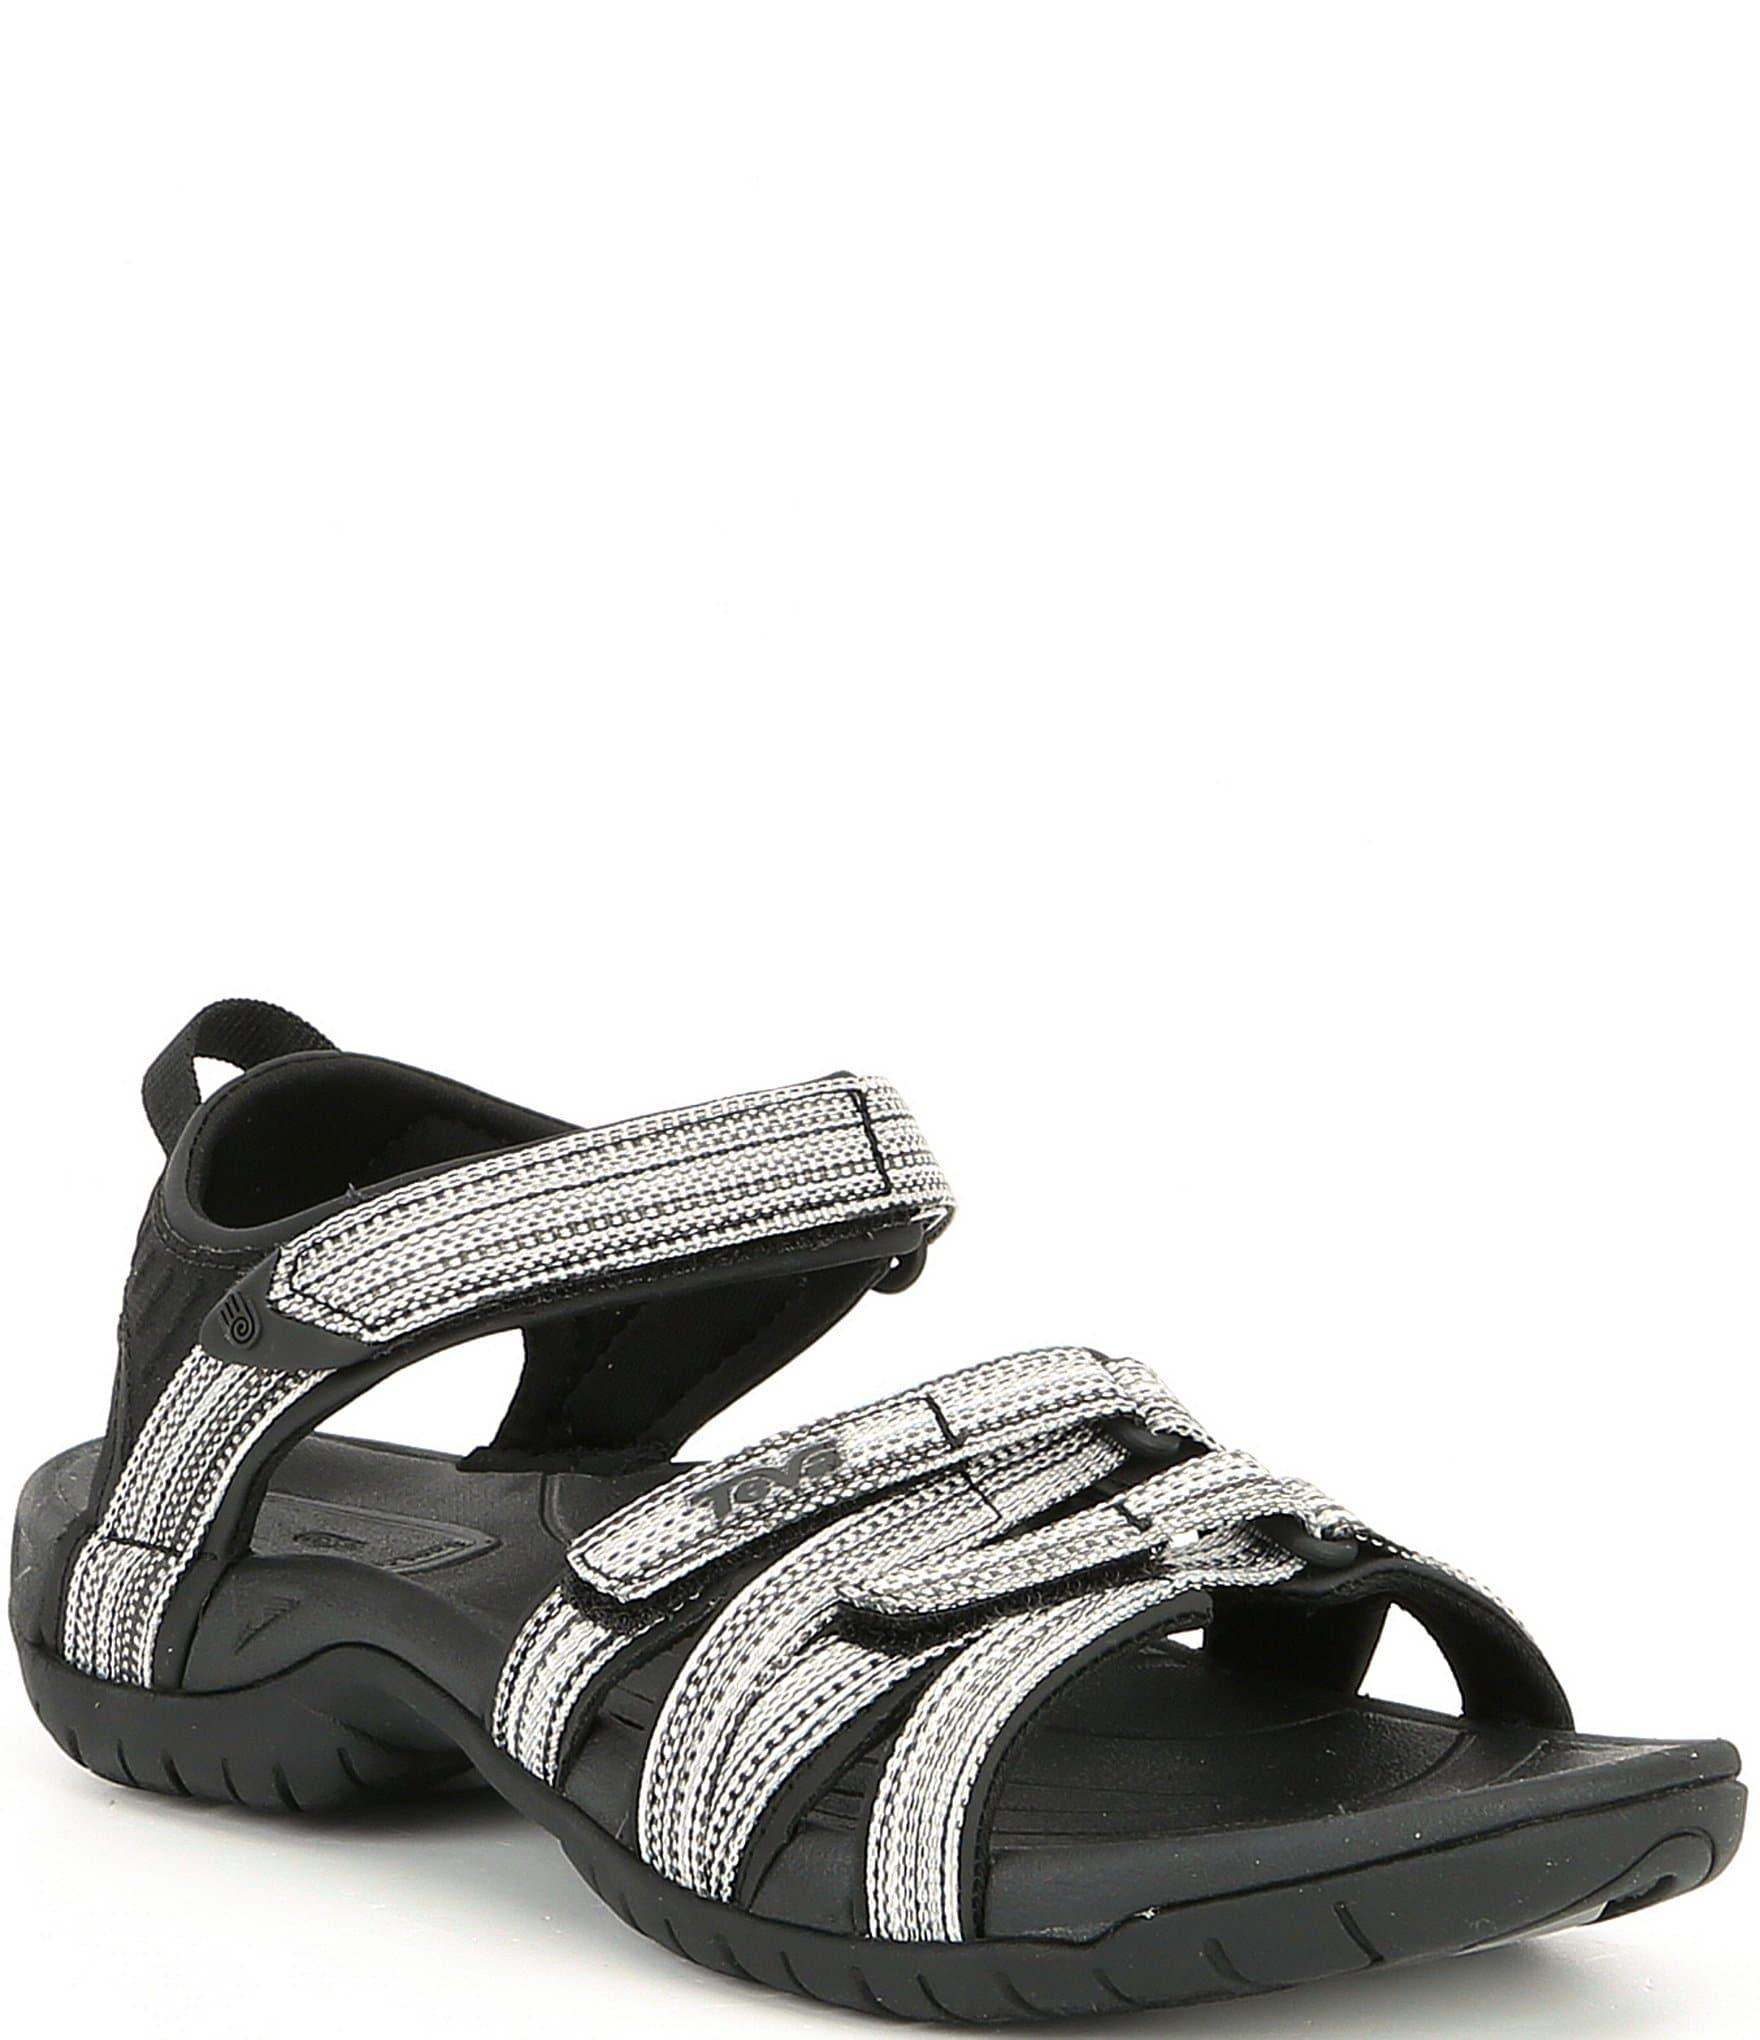 7f7ef4c5d Teva Tirra Womens Sandals